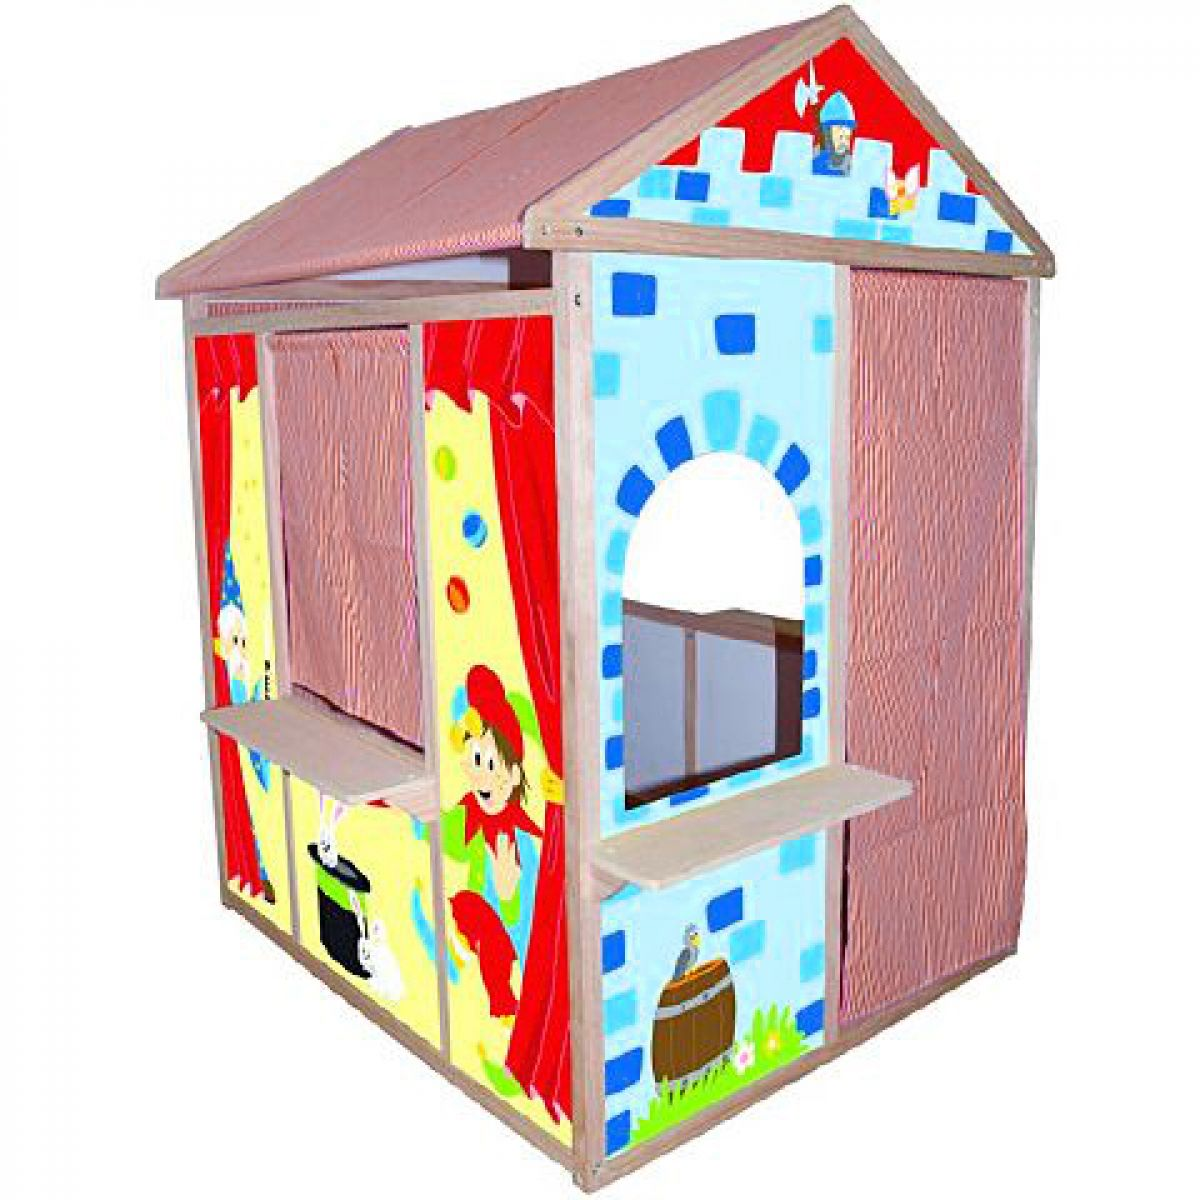 Woody 90897 - Domeček na hraní